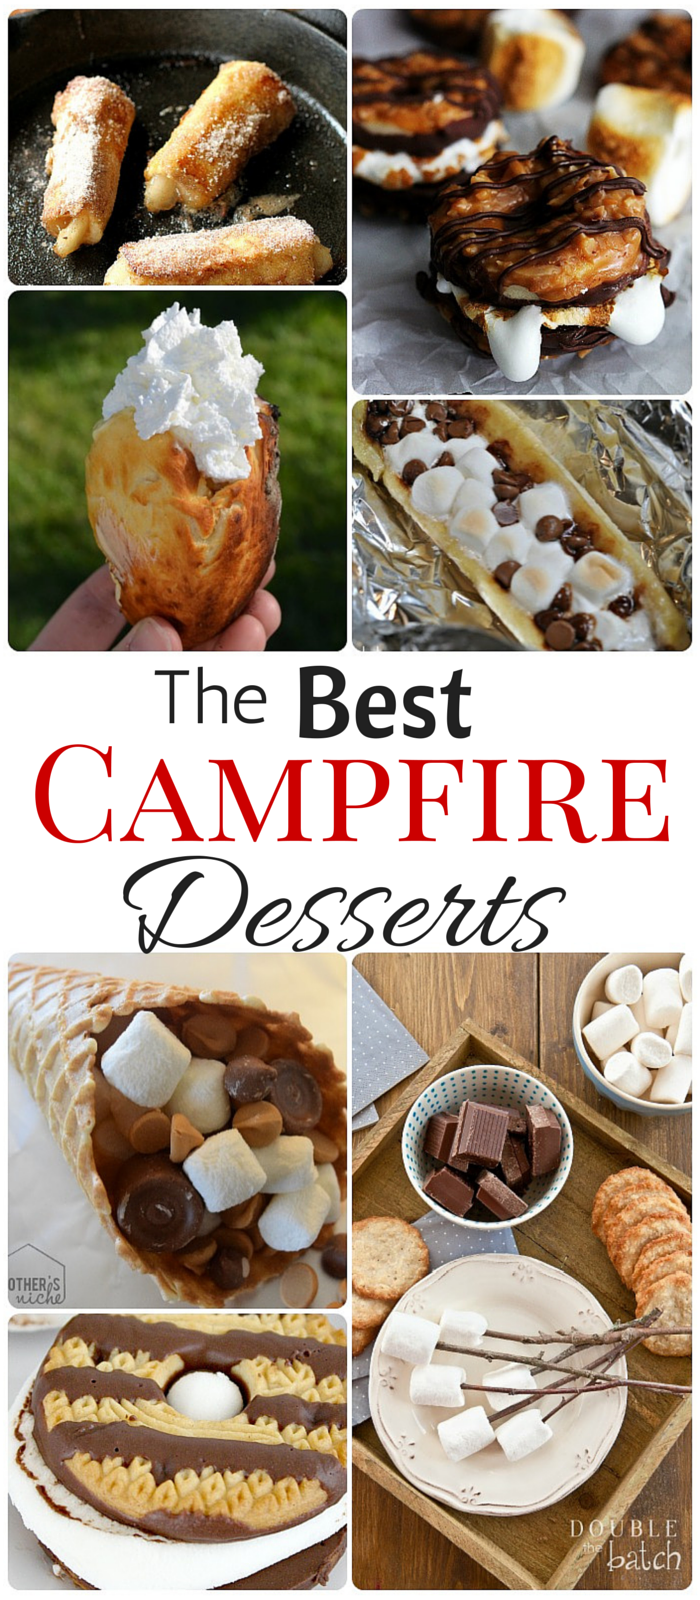 The Best Campfire Desserts